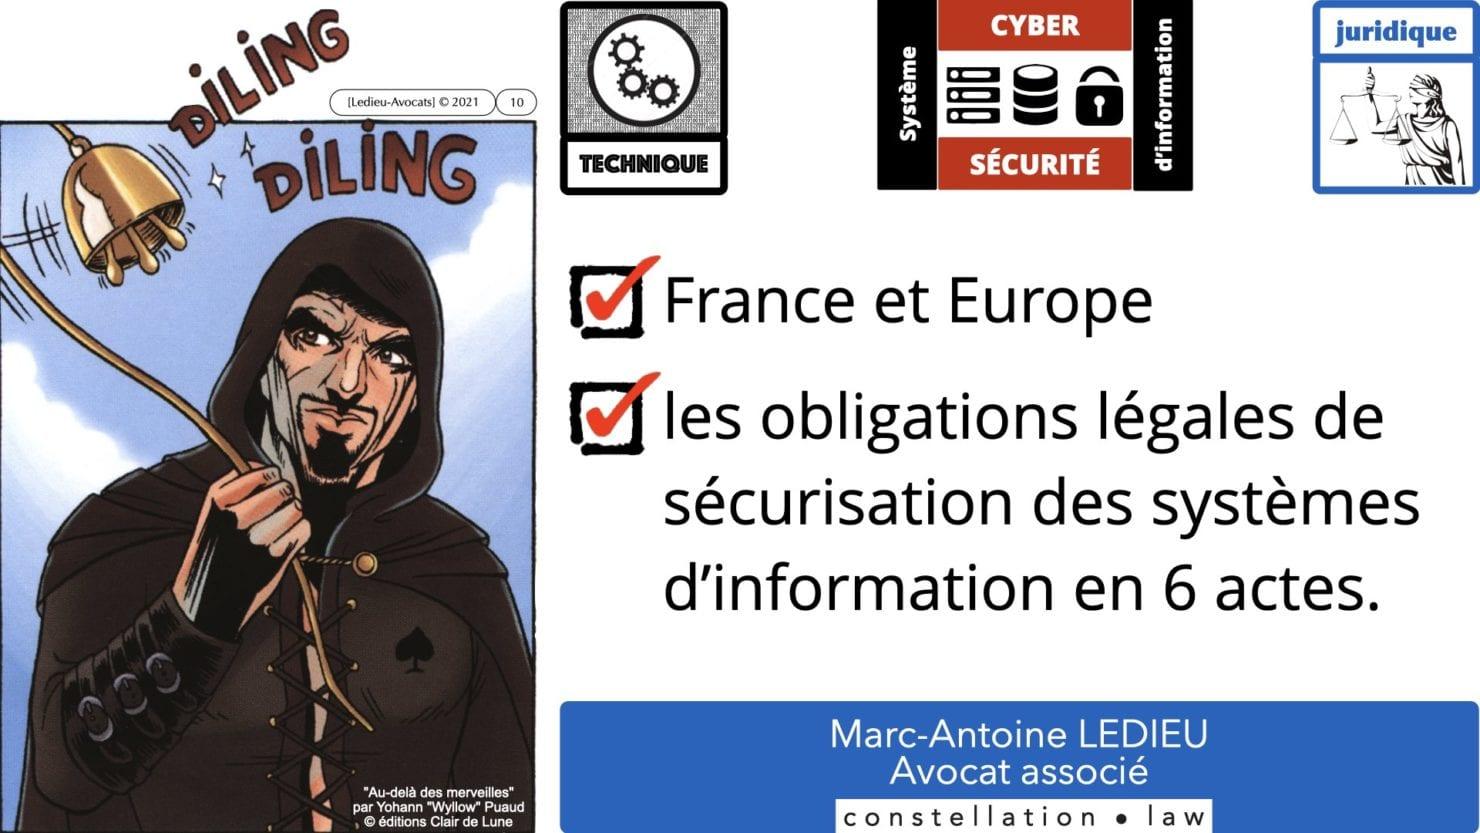 337 cyber sécurité #1 OIV OSE Critical Entities © Ledieu-avocat 15-06-2021.010